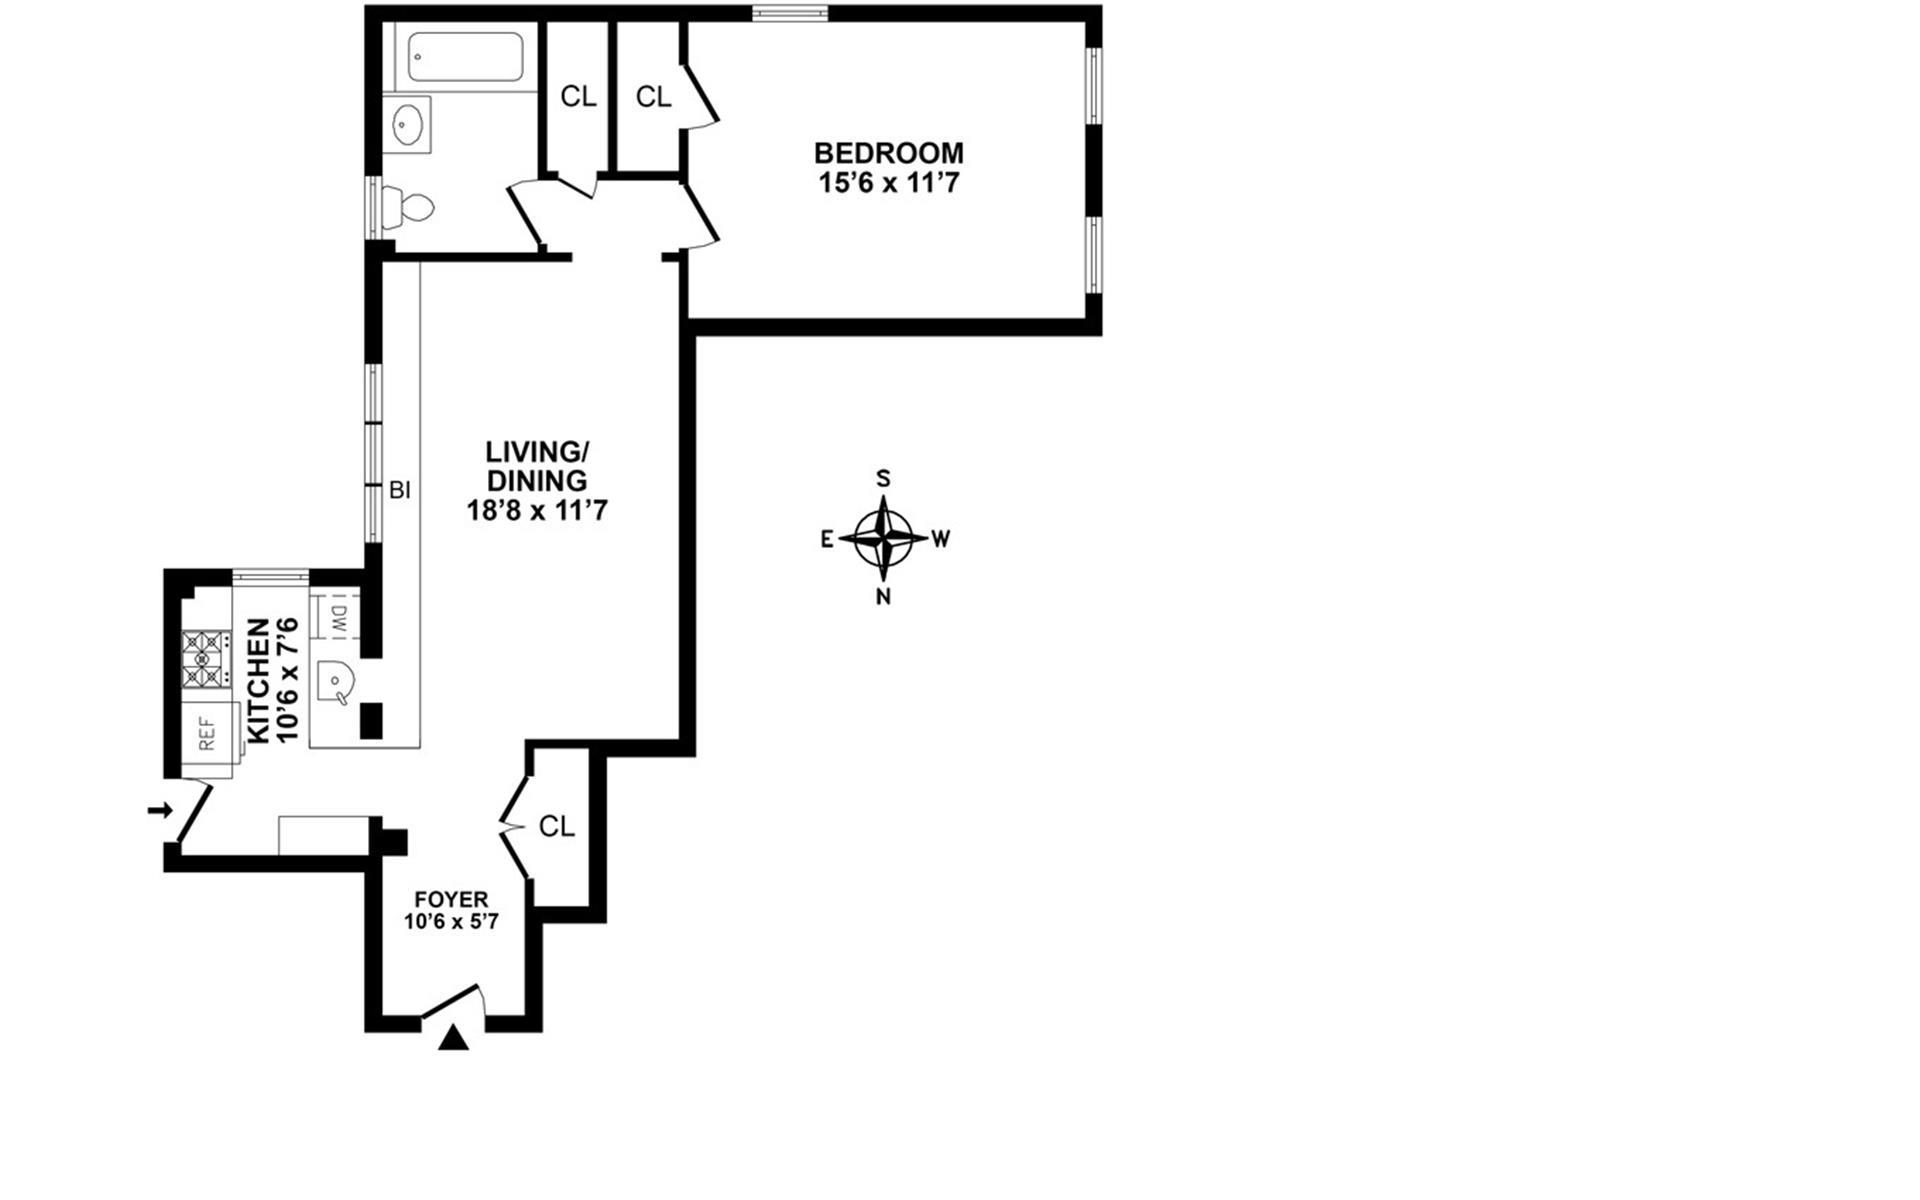 Floor plan of 130 East 94th St, 5C - Carnegie Hill, New York